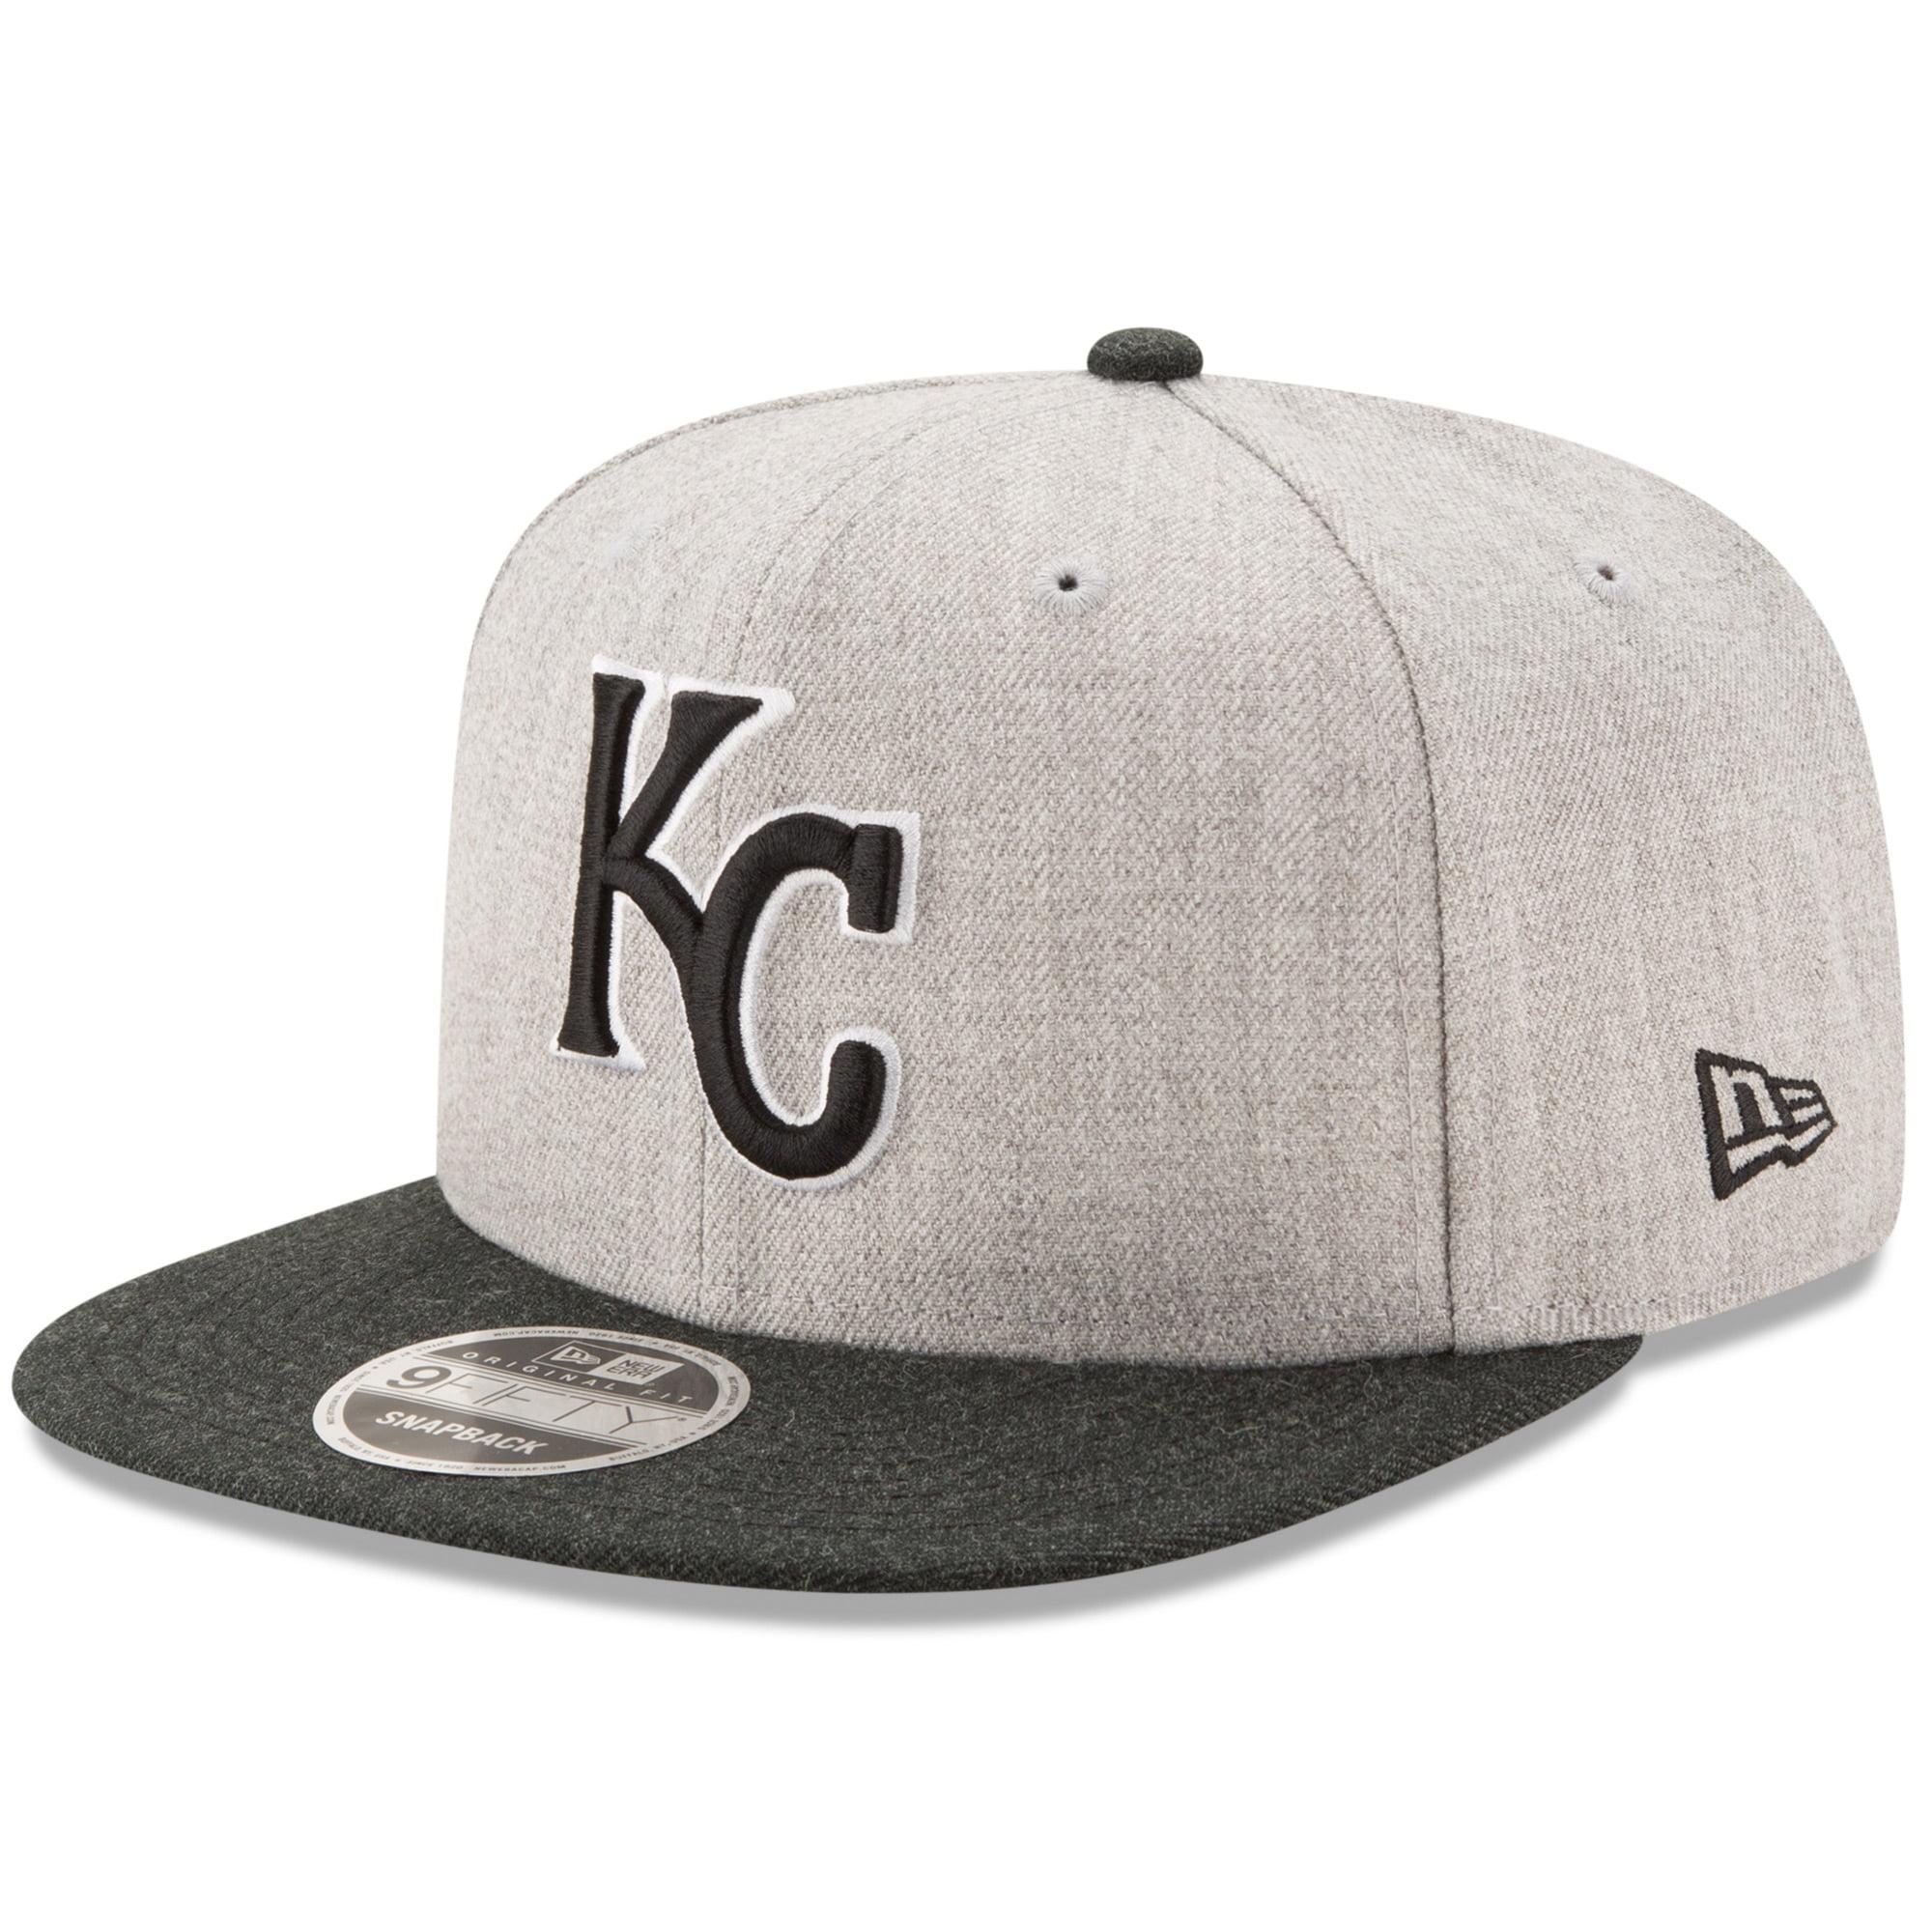 Kansas City Royals New Era Action Original Fit 9FIFTY Adjustable Snapback Hat - Heathered Gray/Black - OSFA